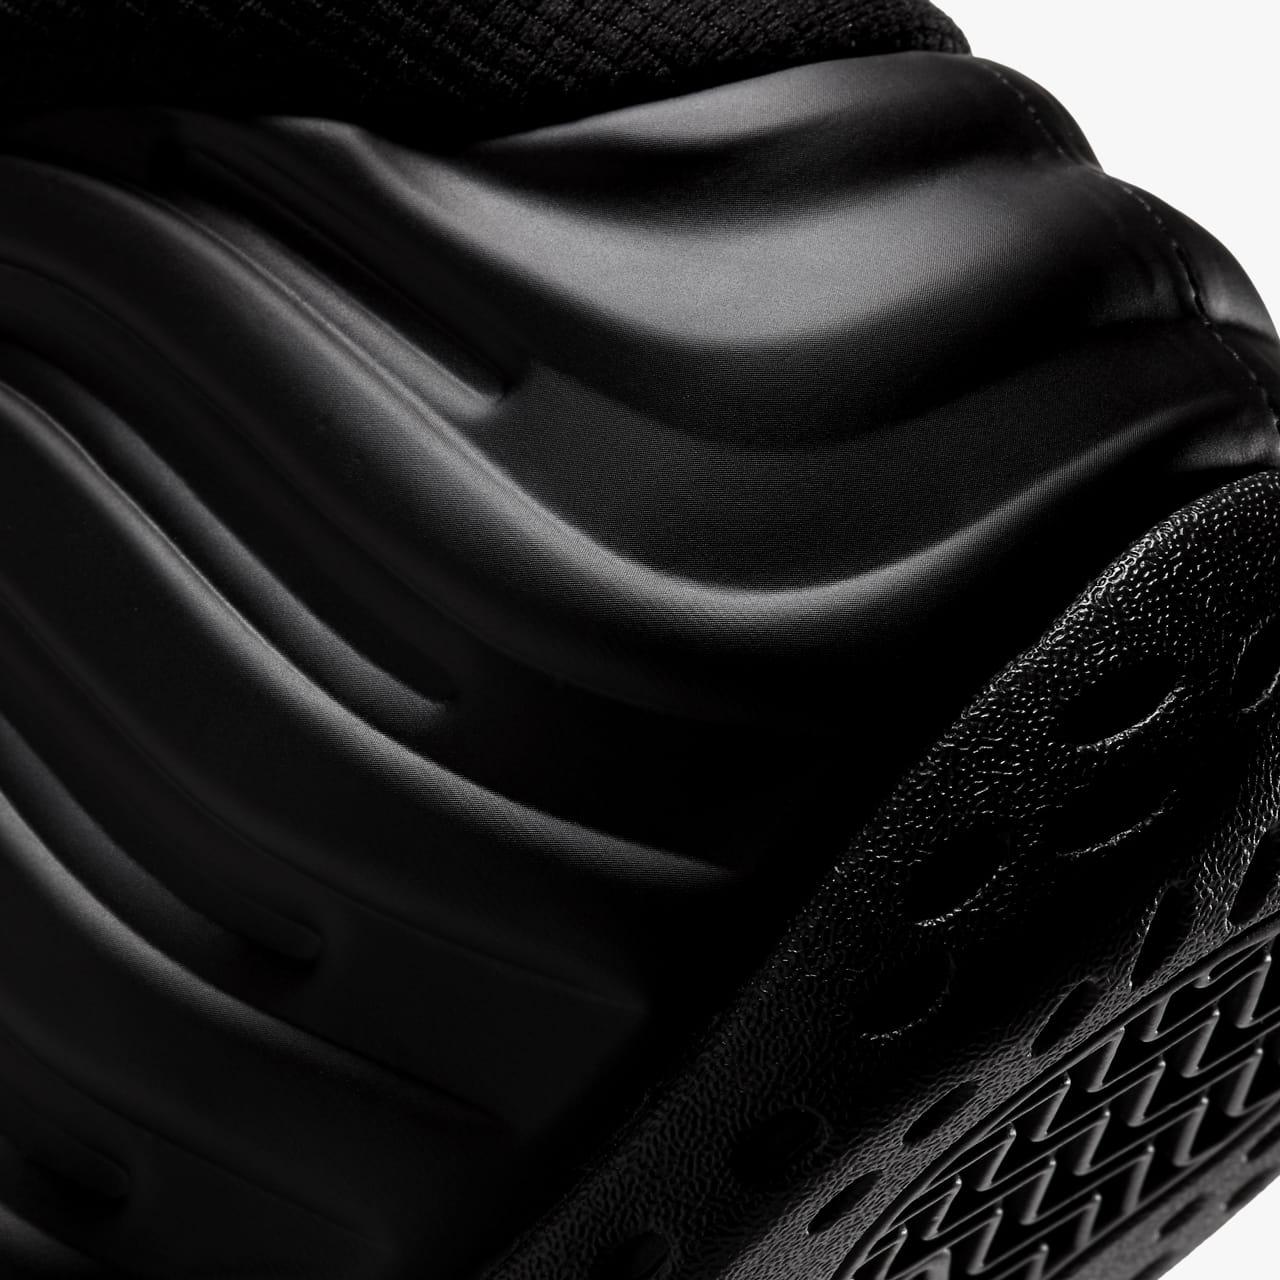 Nike Air Foamposite One vs. Nike Air Foamposite Pro